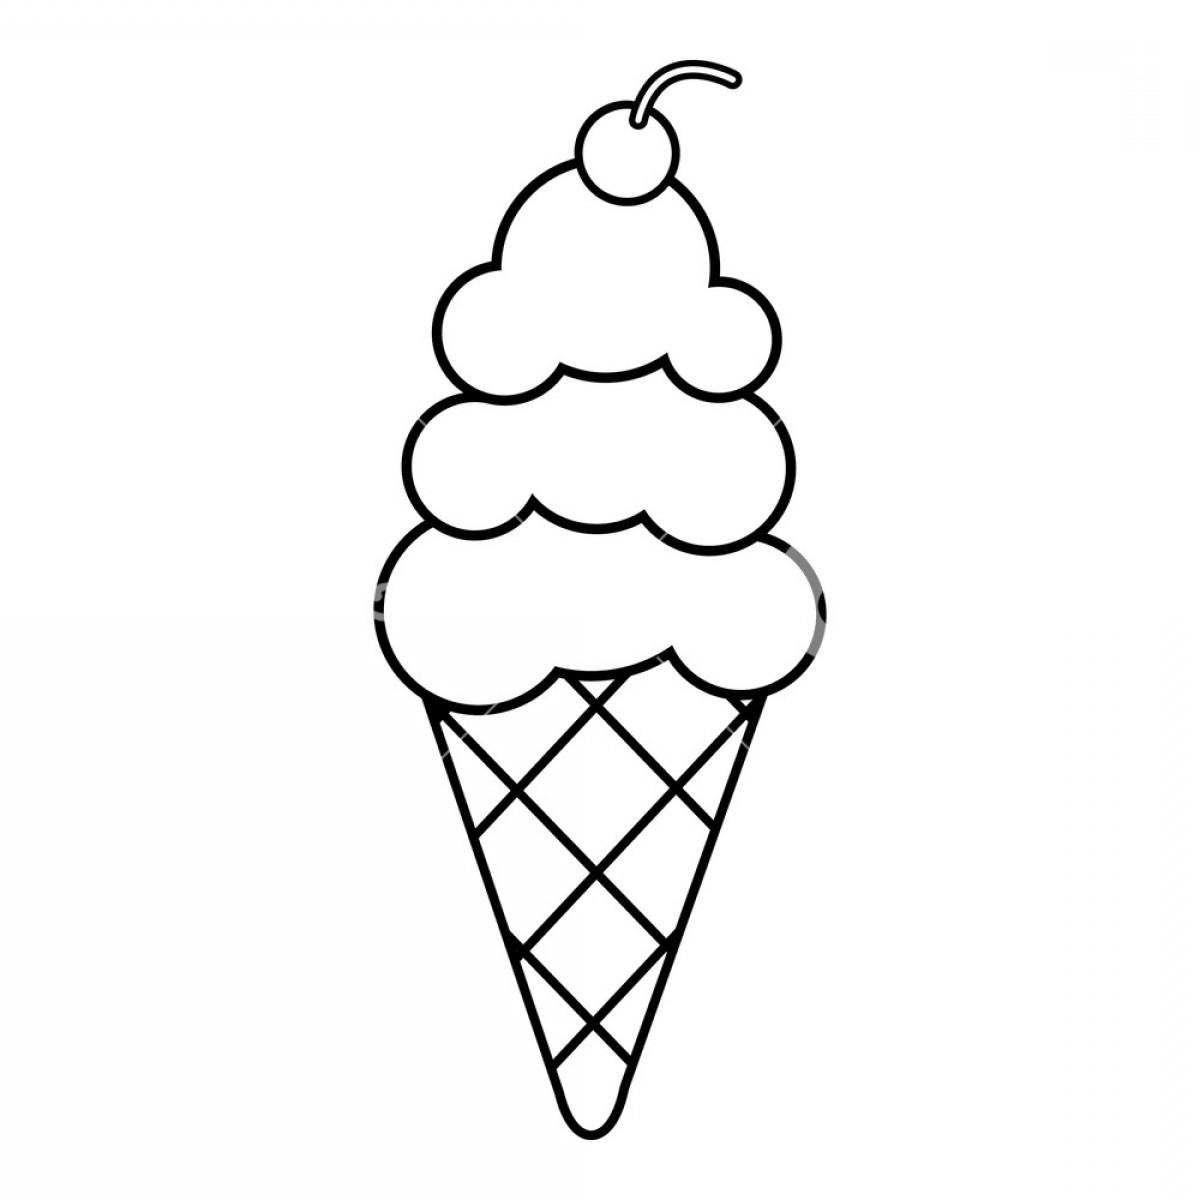 Flat ice cream cone black and white clipart banner library library Vanilla Ice Cream Icon Outline Illustration Of Vanilla Ice Cream ... banner library library